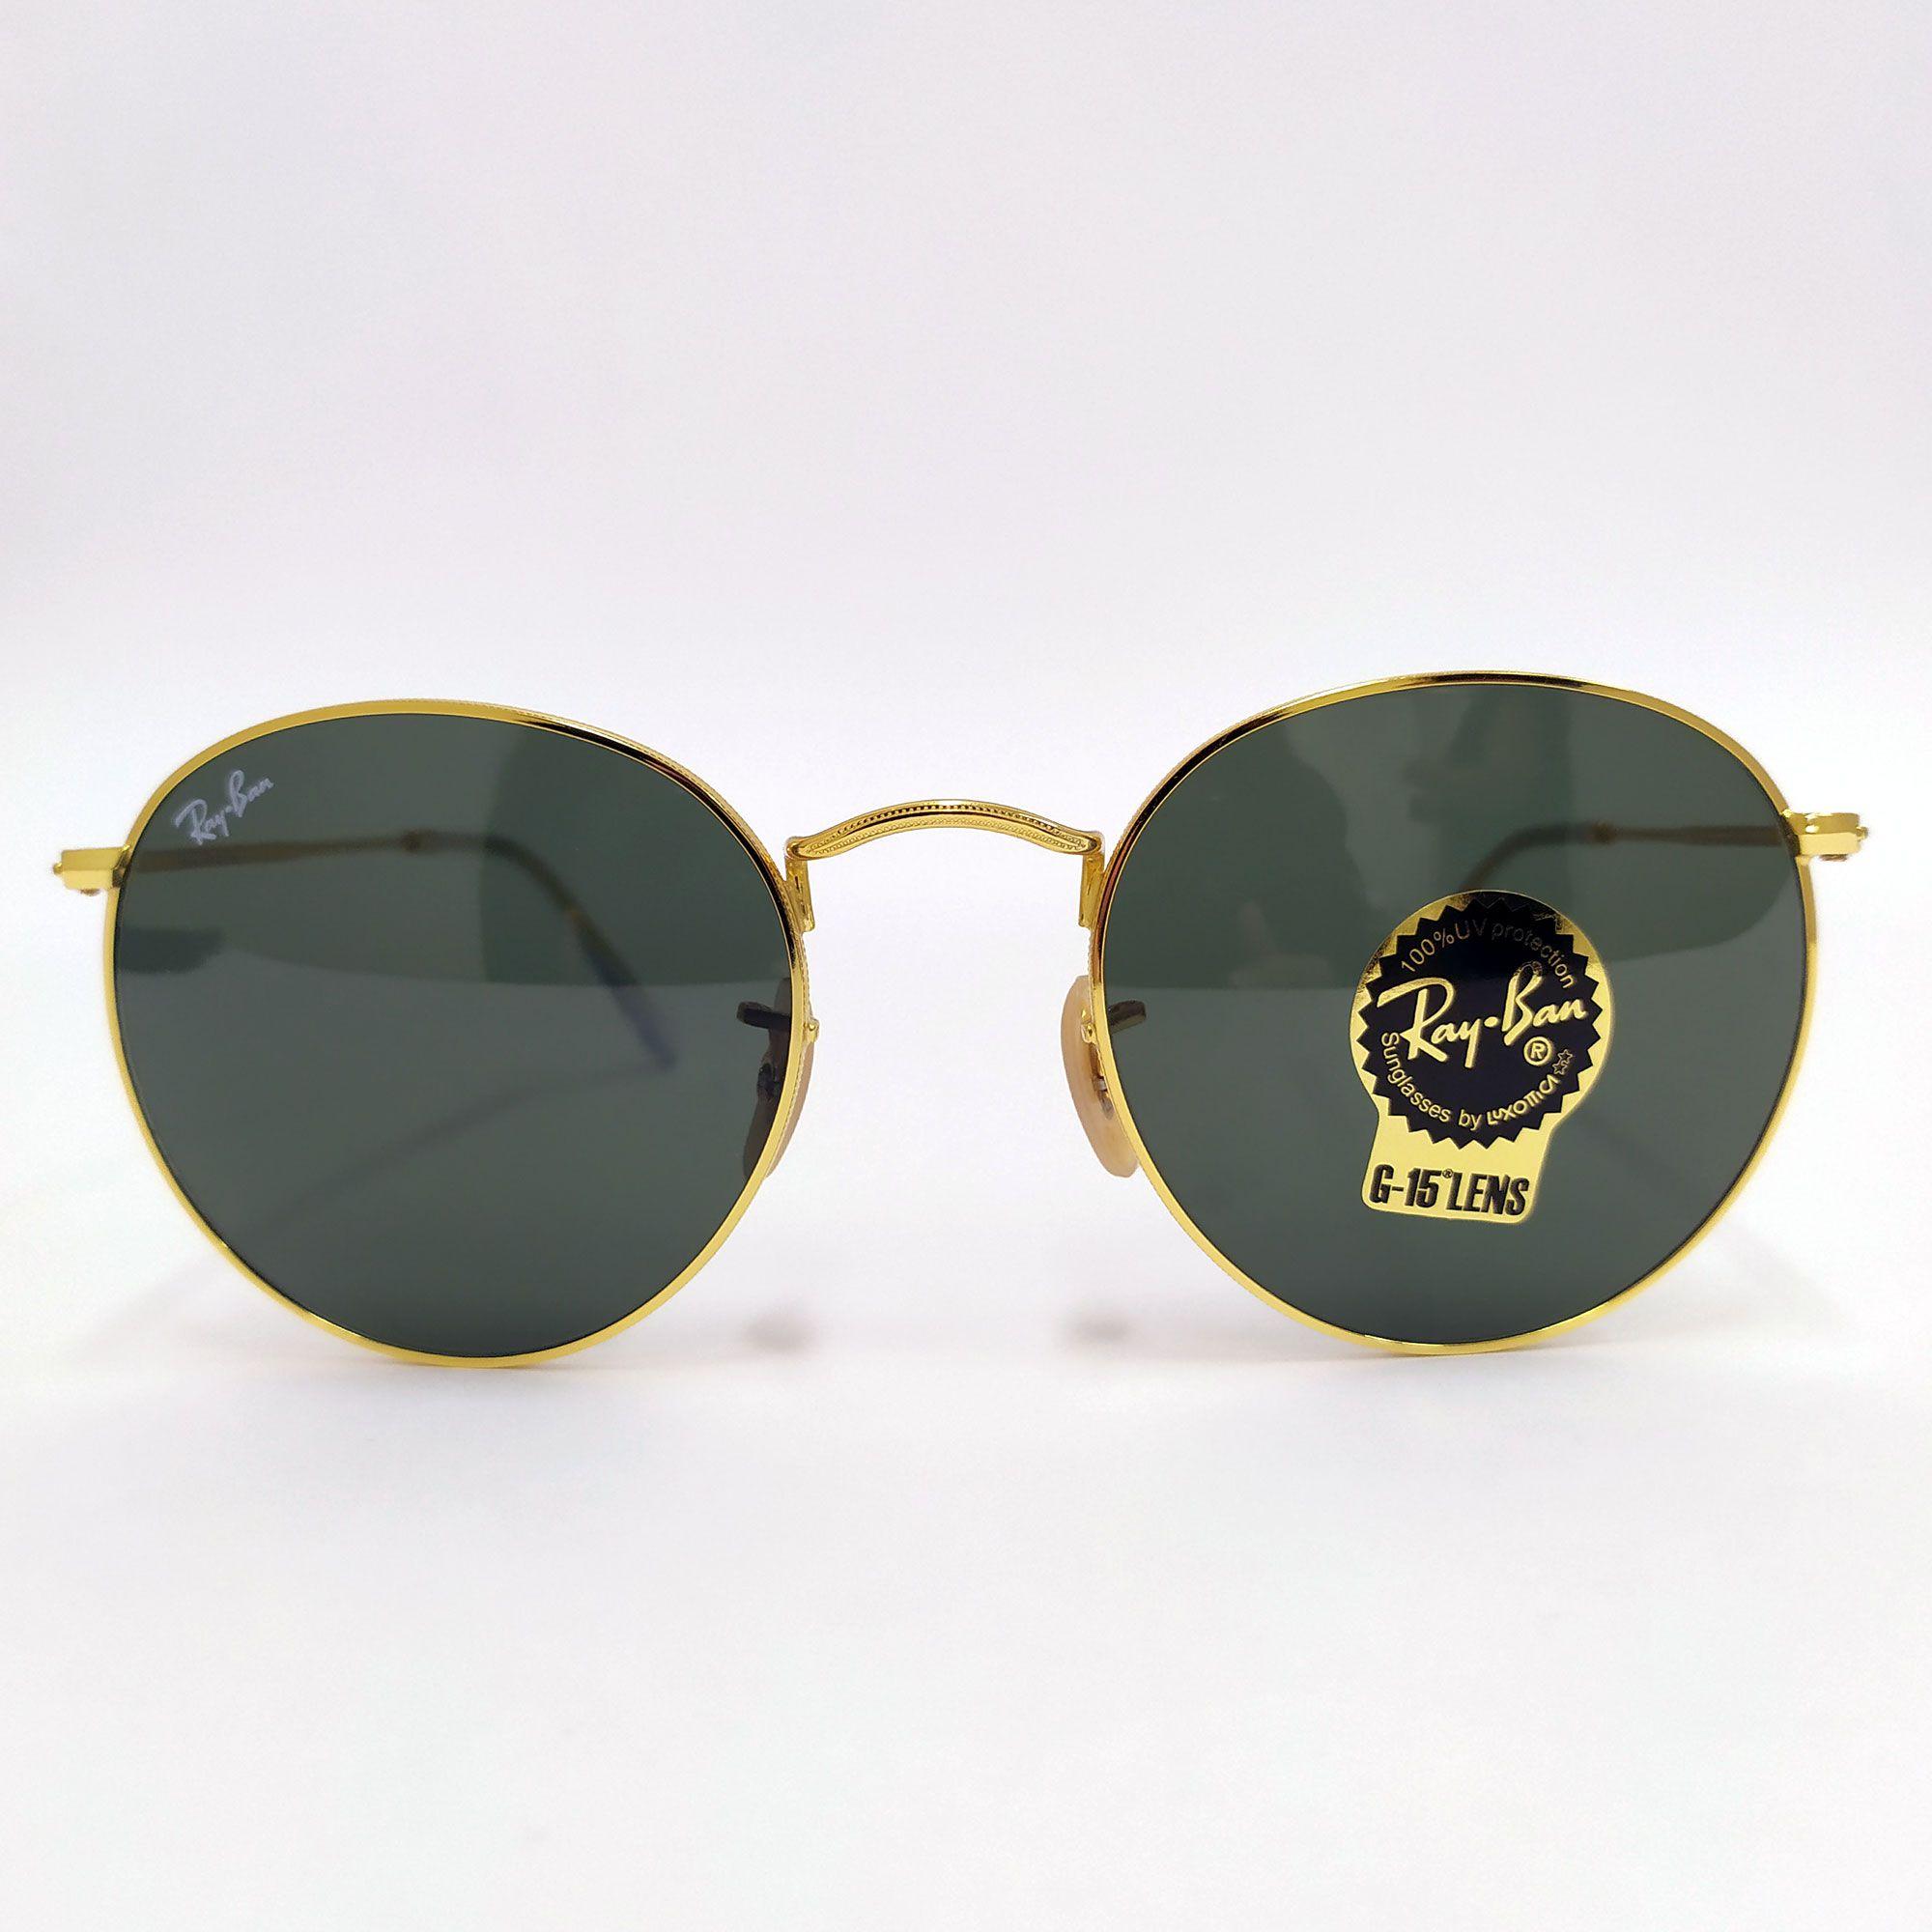 Óculos de Sol Ray-Ban Round Metal com lente Verde Clássica G-15 3447L